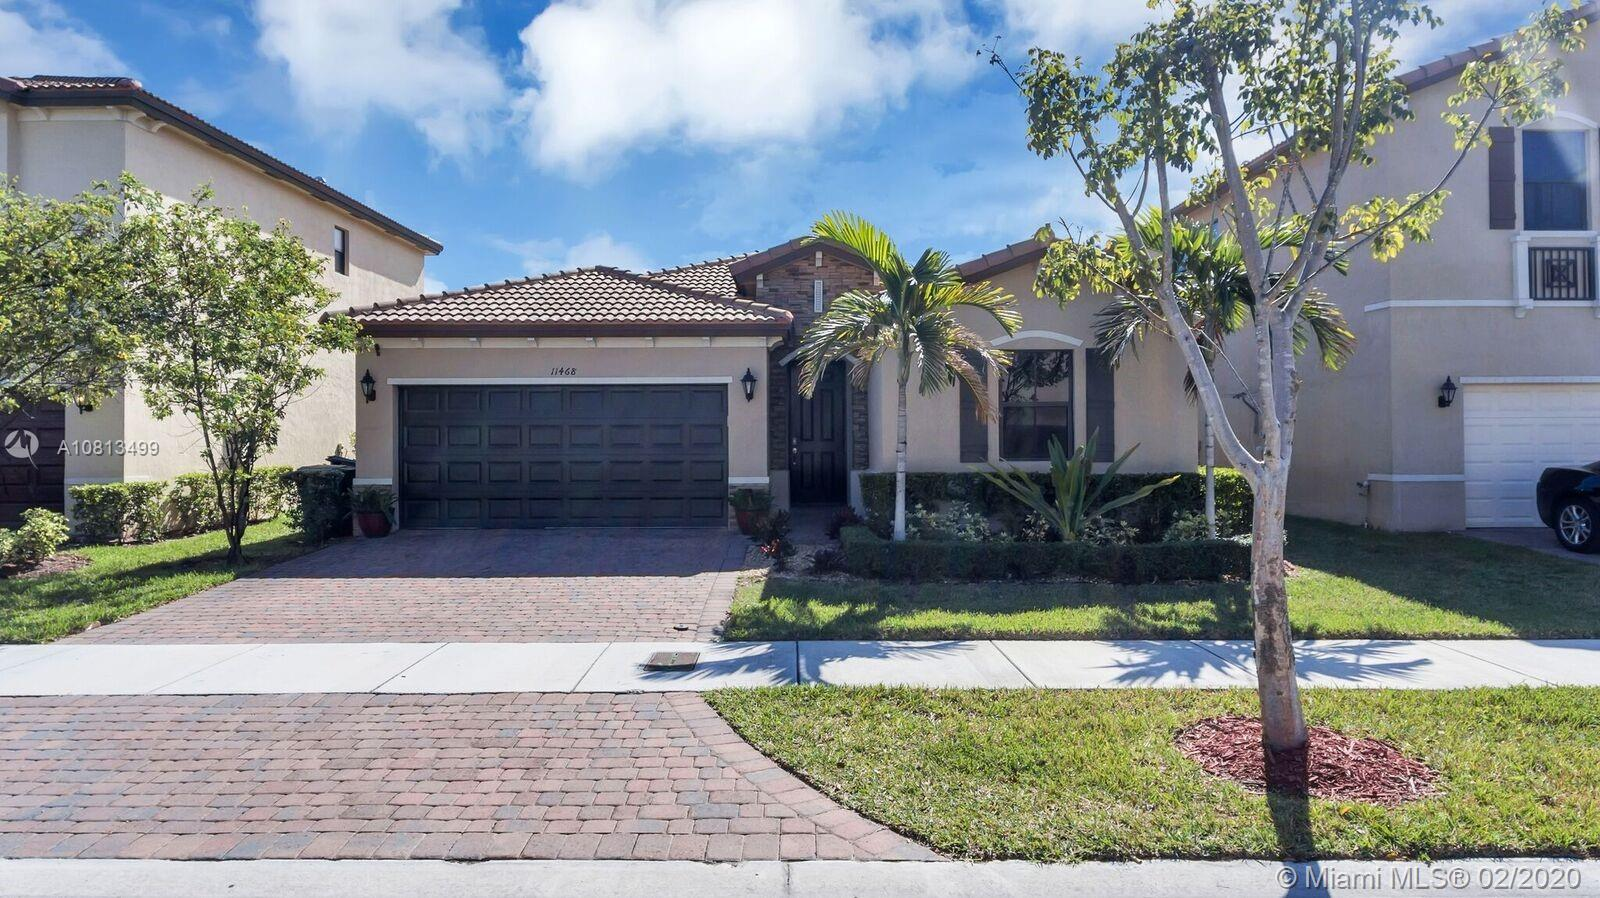 11468 SW 239th Ter, Homestead, FL 33032 - Homestead, FL real estate listing